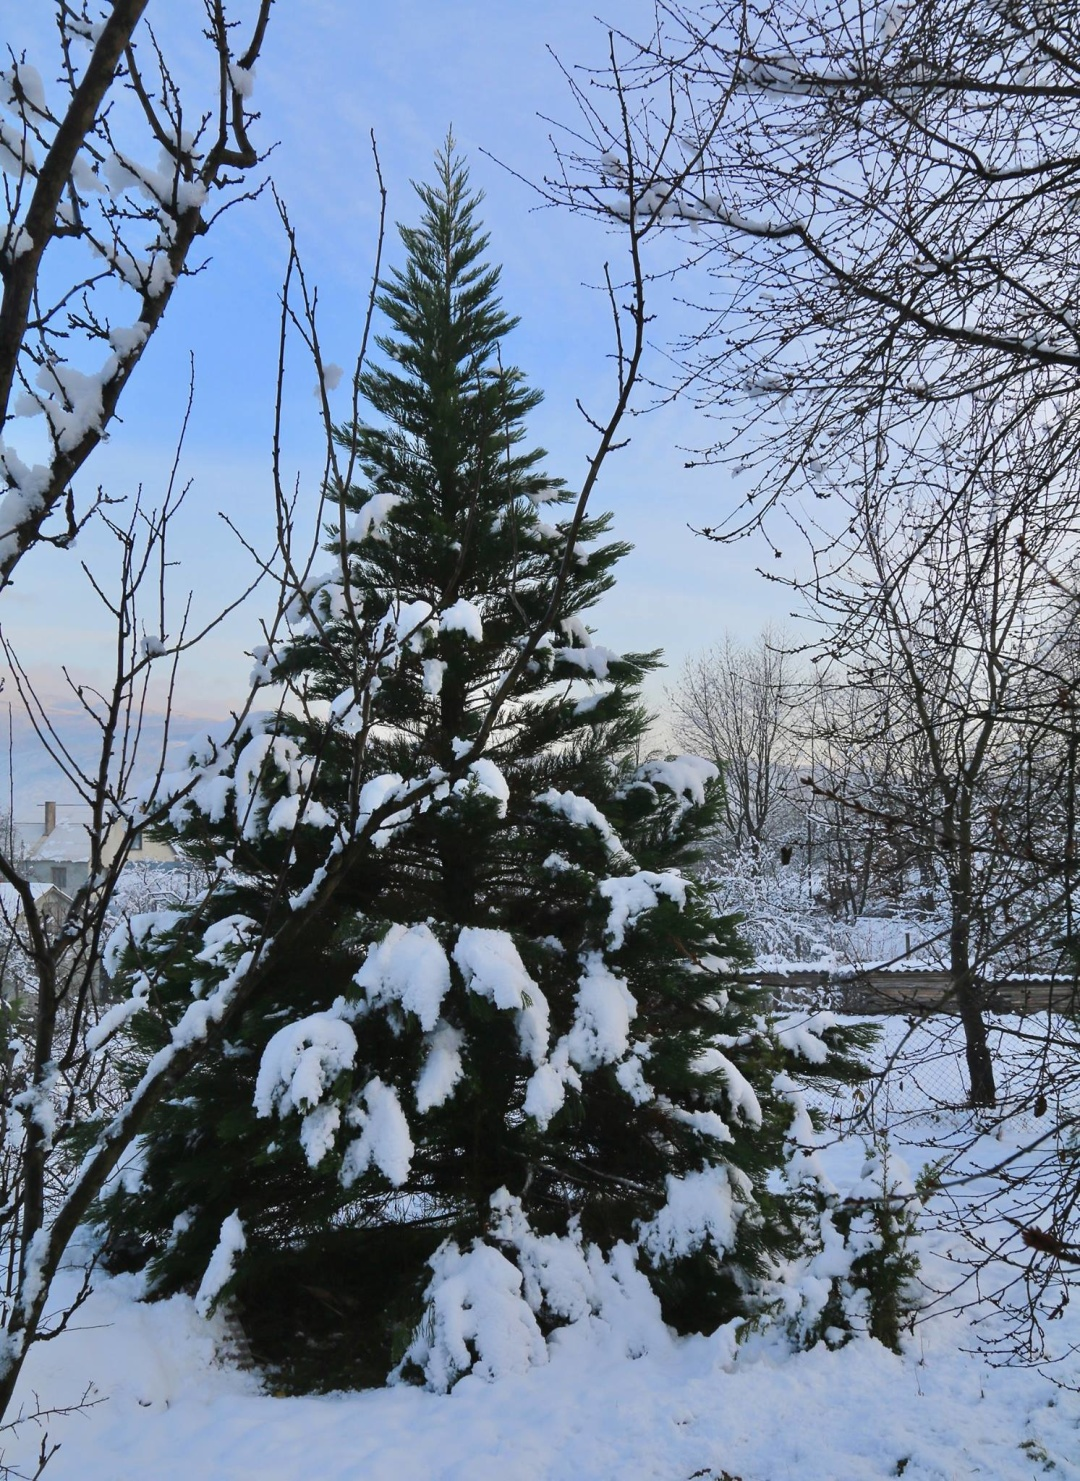 Мамонтове дерево взимку